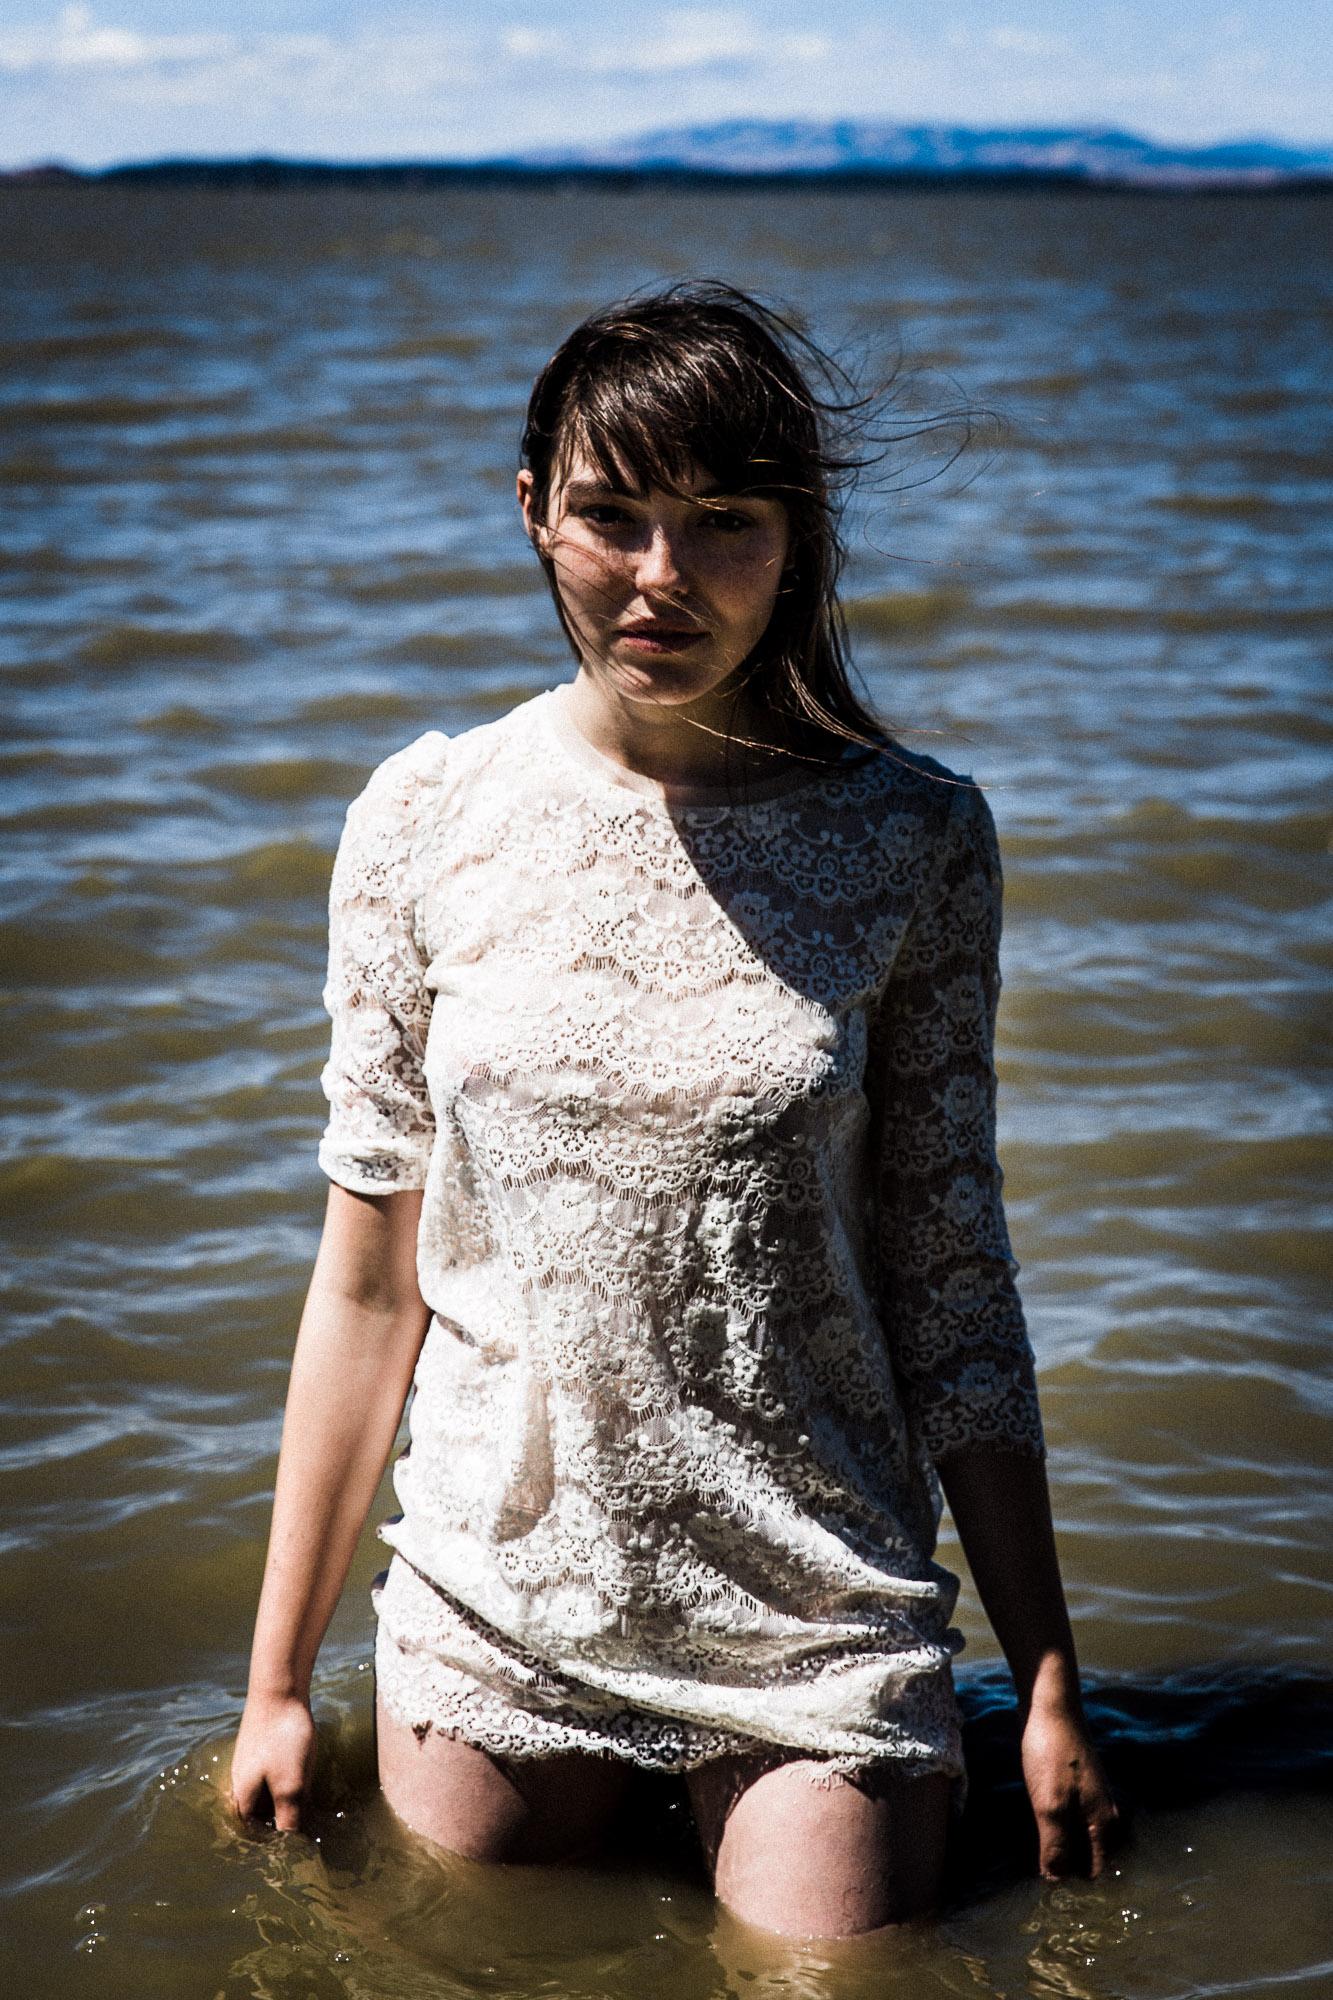 Lizzie-Mud-14-5729.jpg